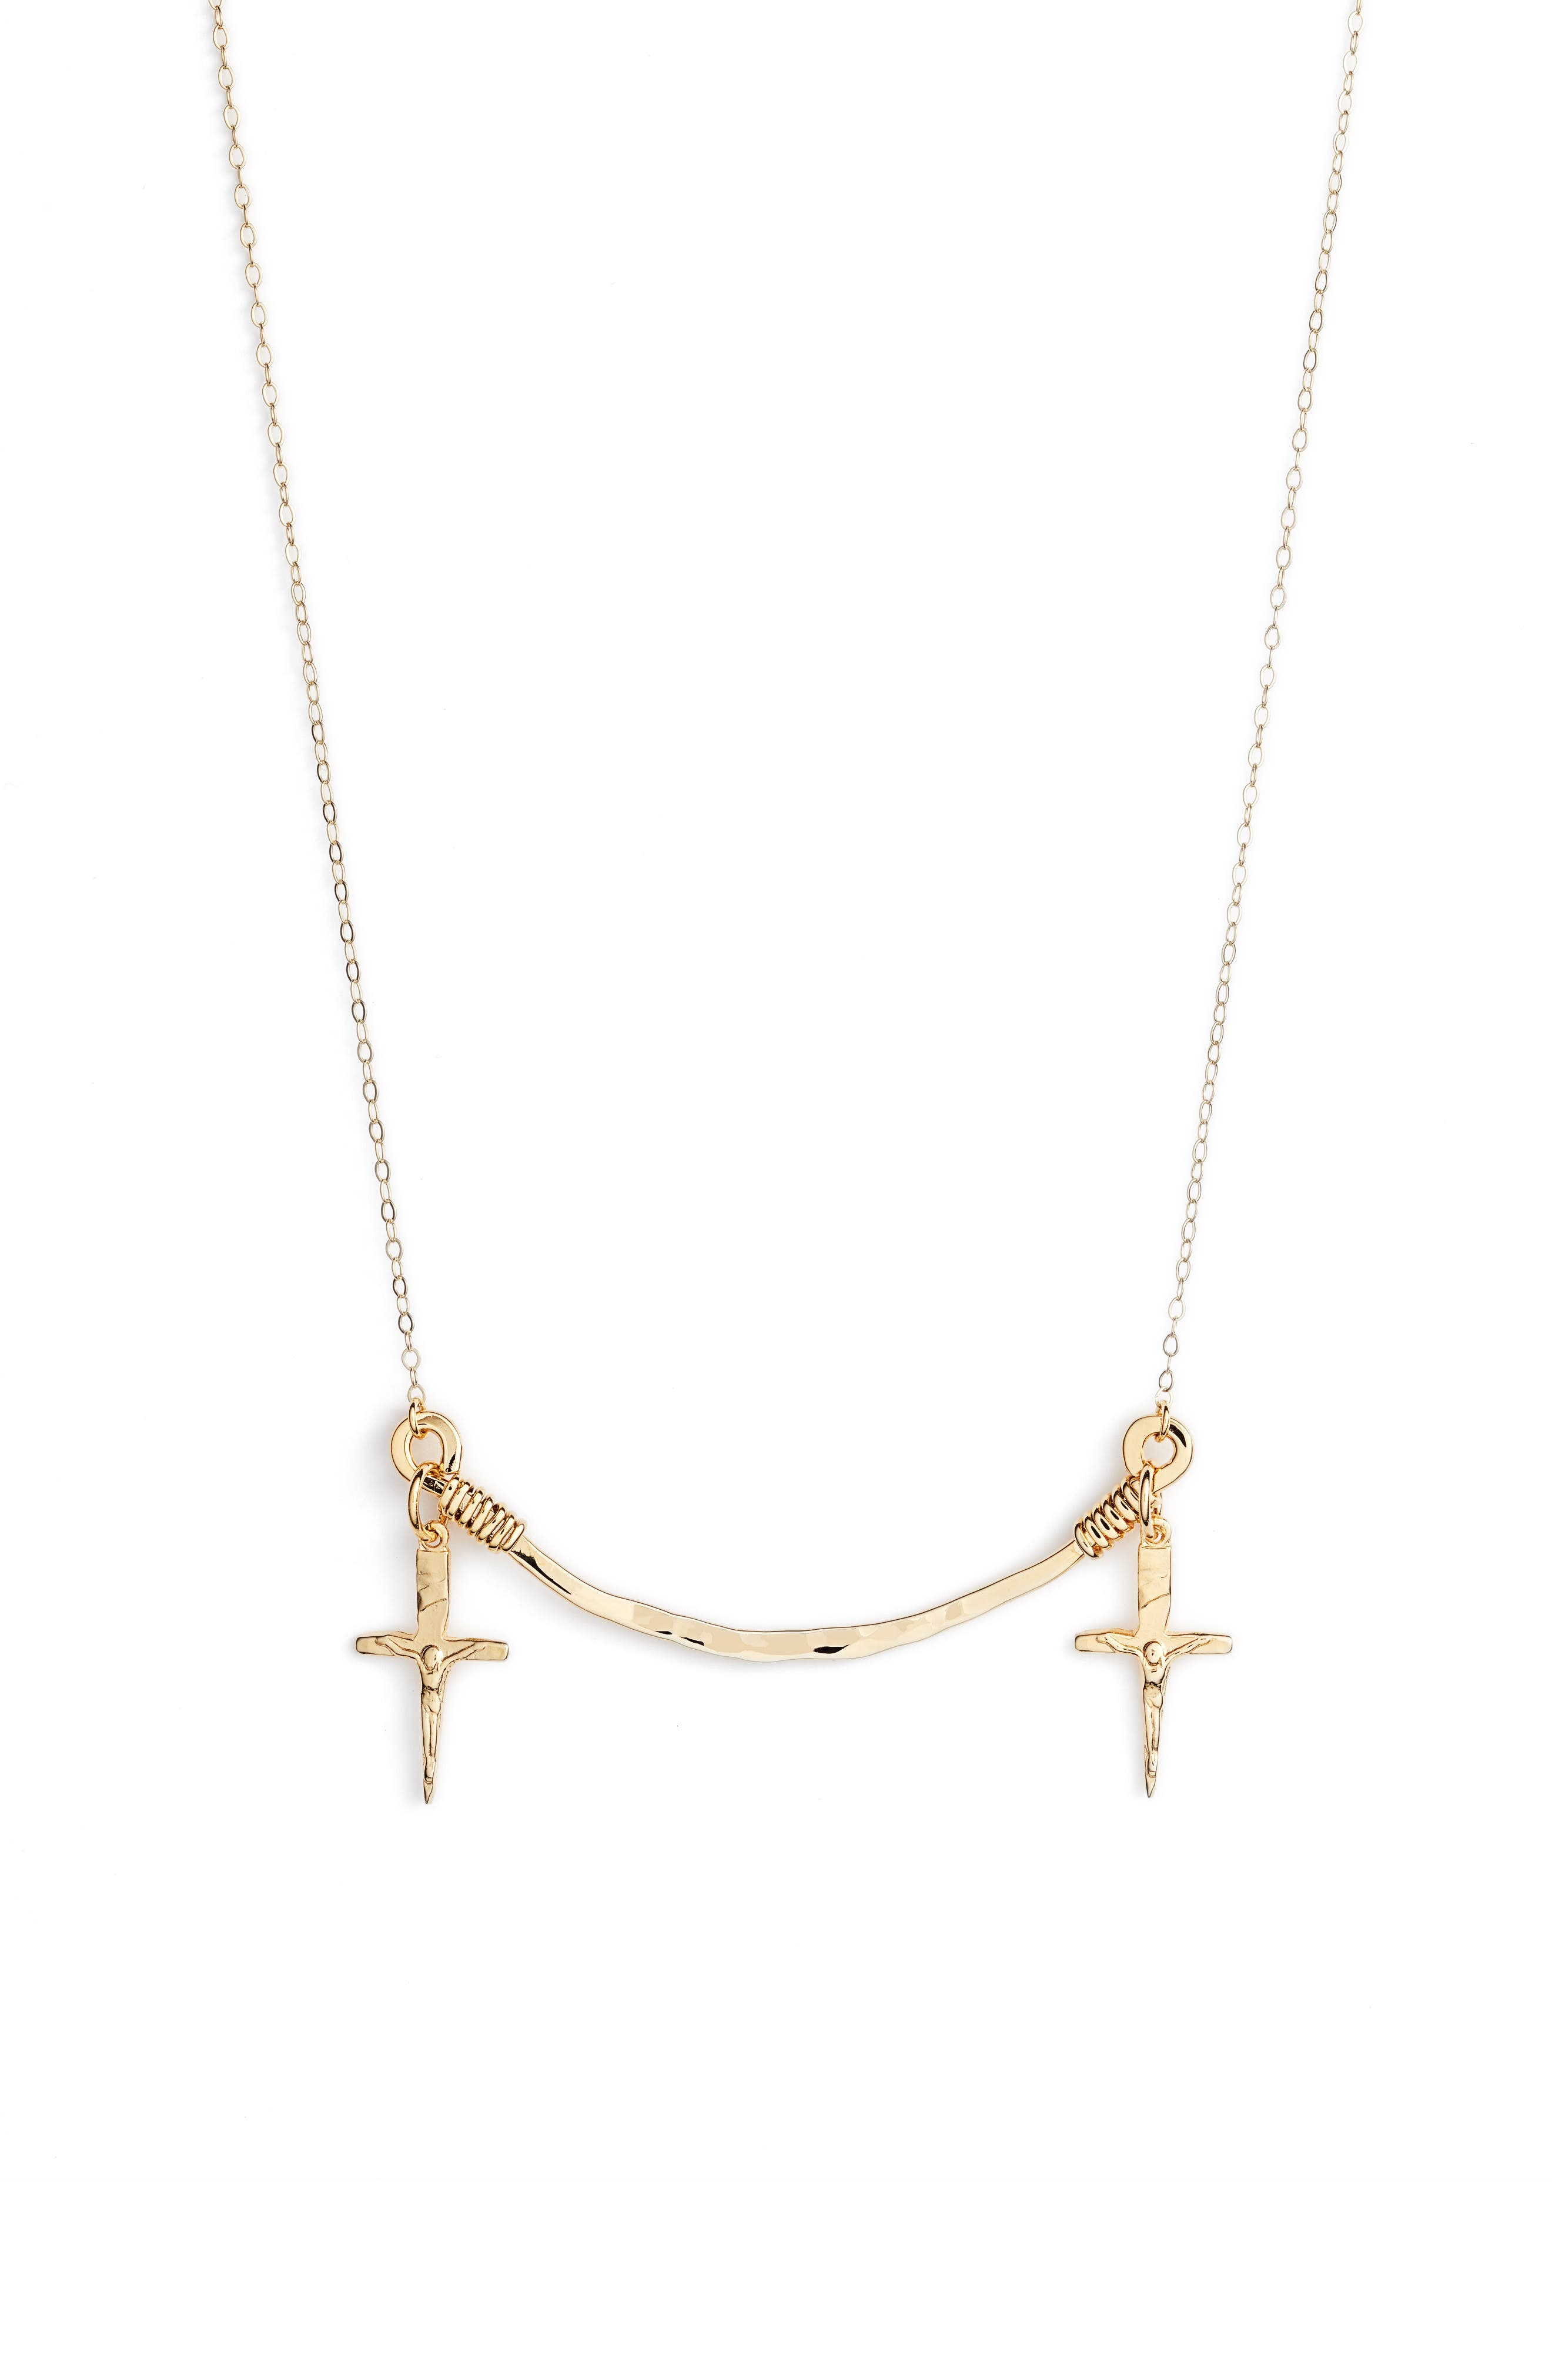 BRITT BOLTON Frontal Necklace